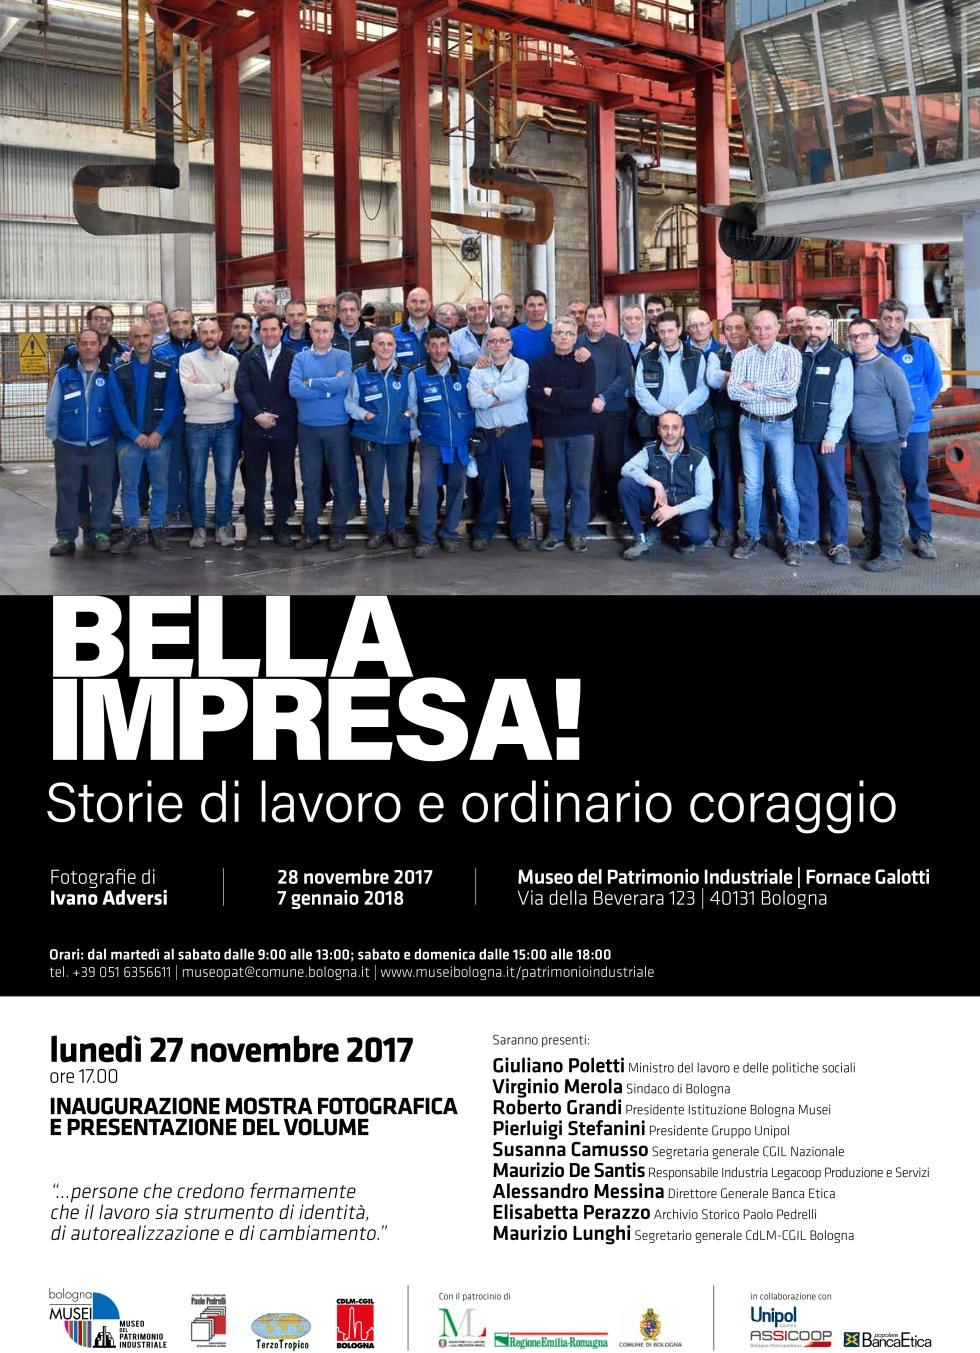 locandina_A3_mostra_bella_impresa.jpg